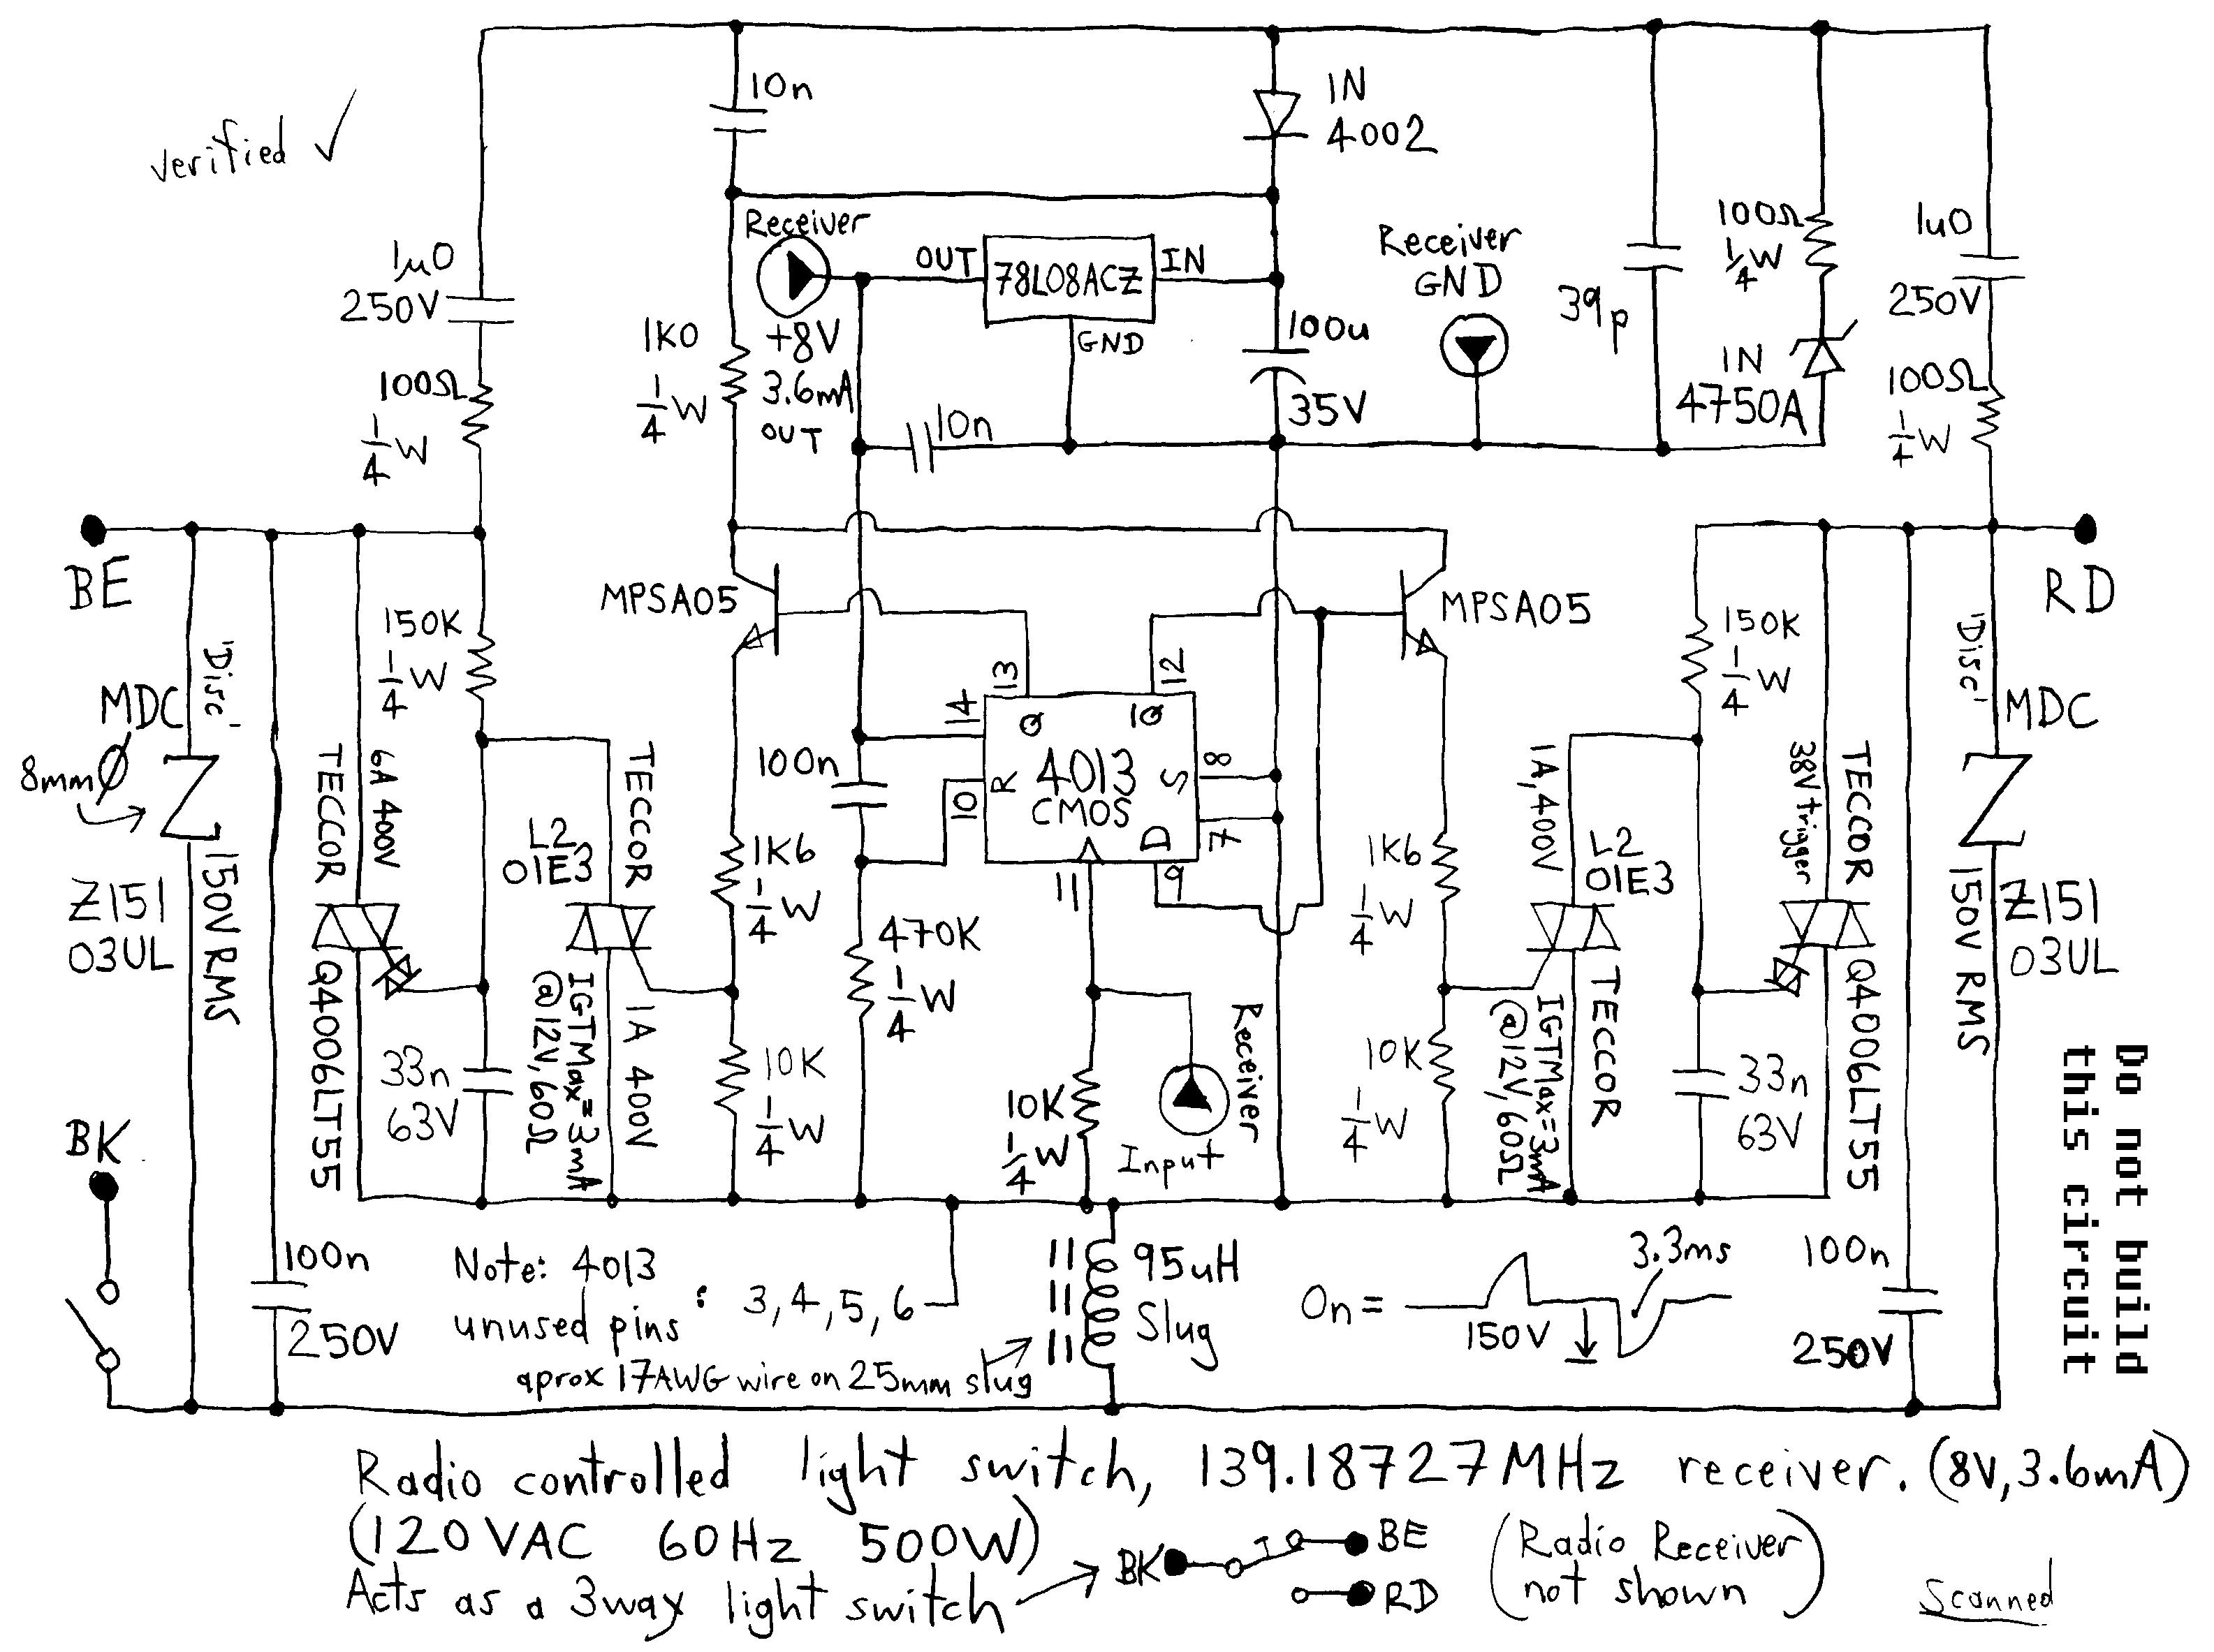 Berühmt Denso O2 Sensor Schaltplan Galerie - Der Schaltplan ...